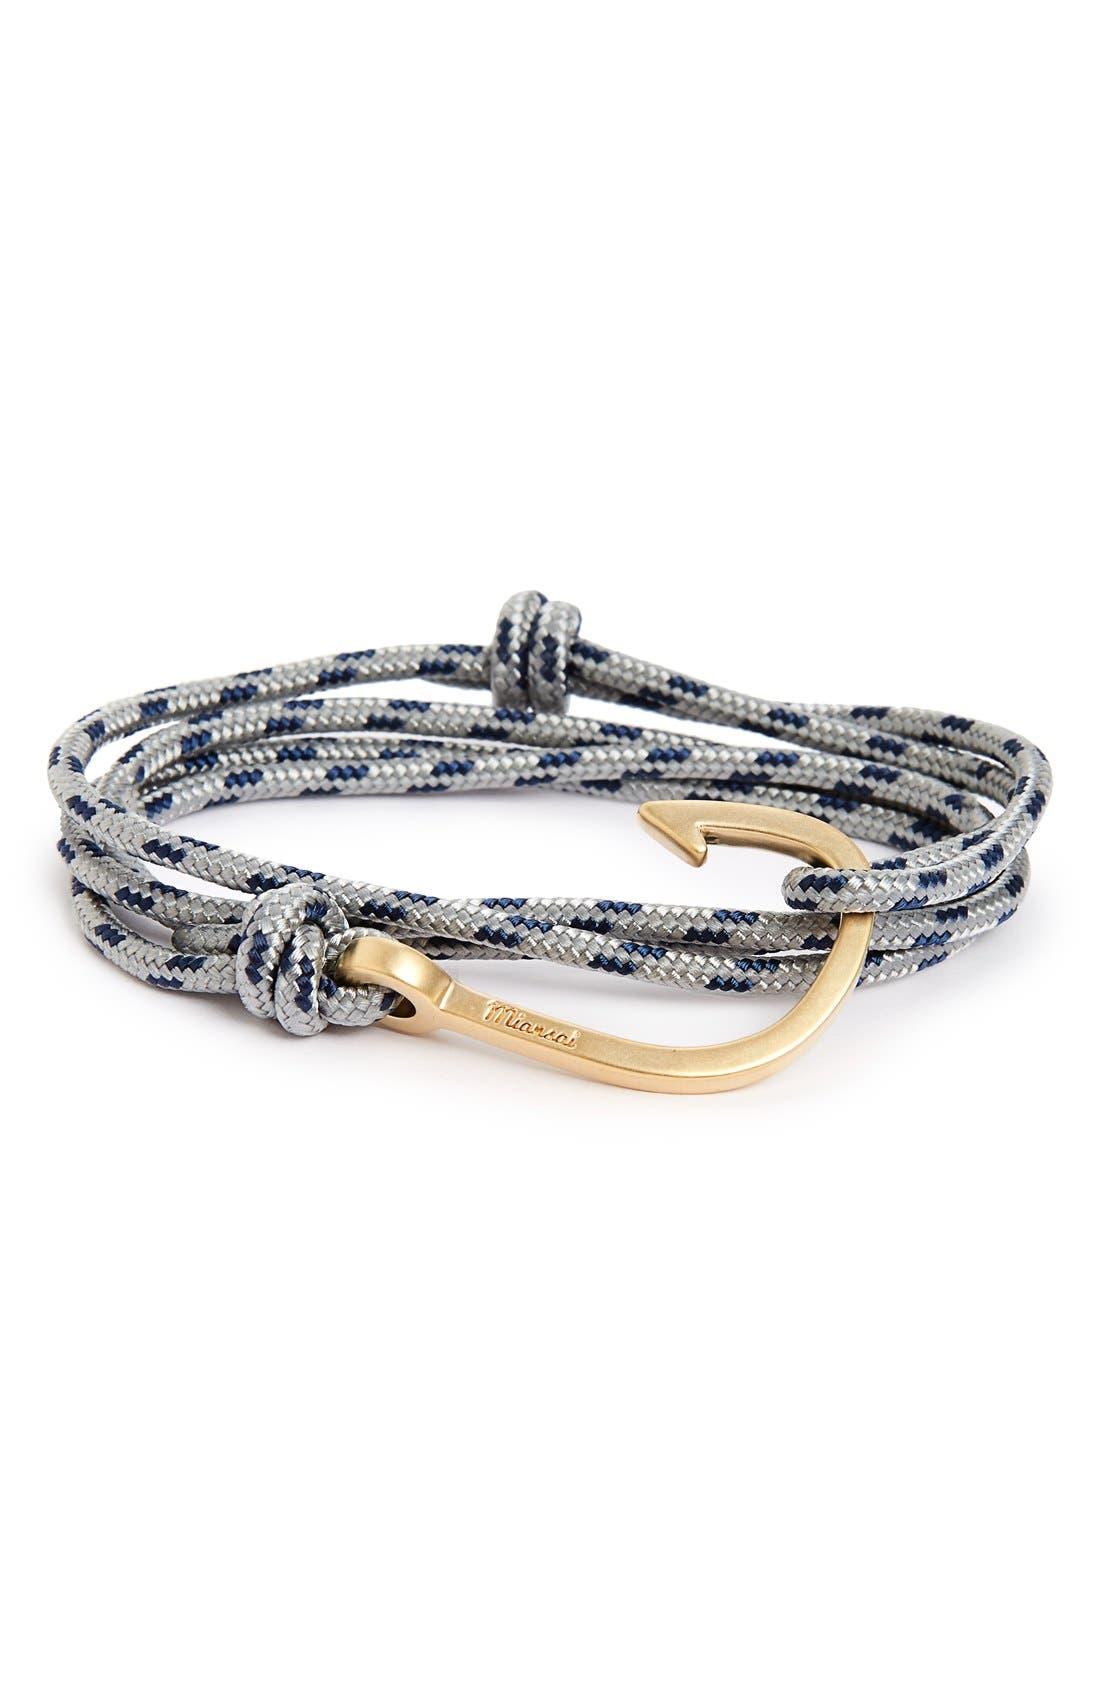 Hook Rope Wrap Bracelet,                             Main thumbnail 1, color,                             Steel